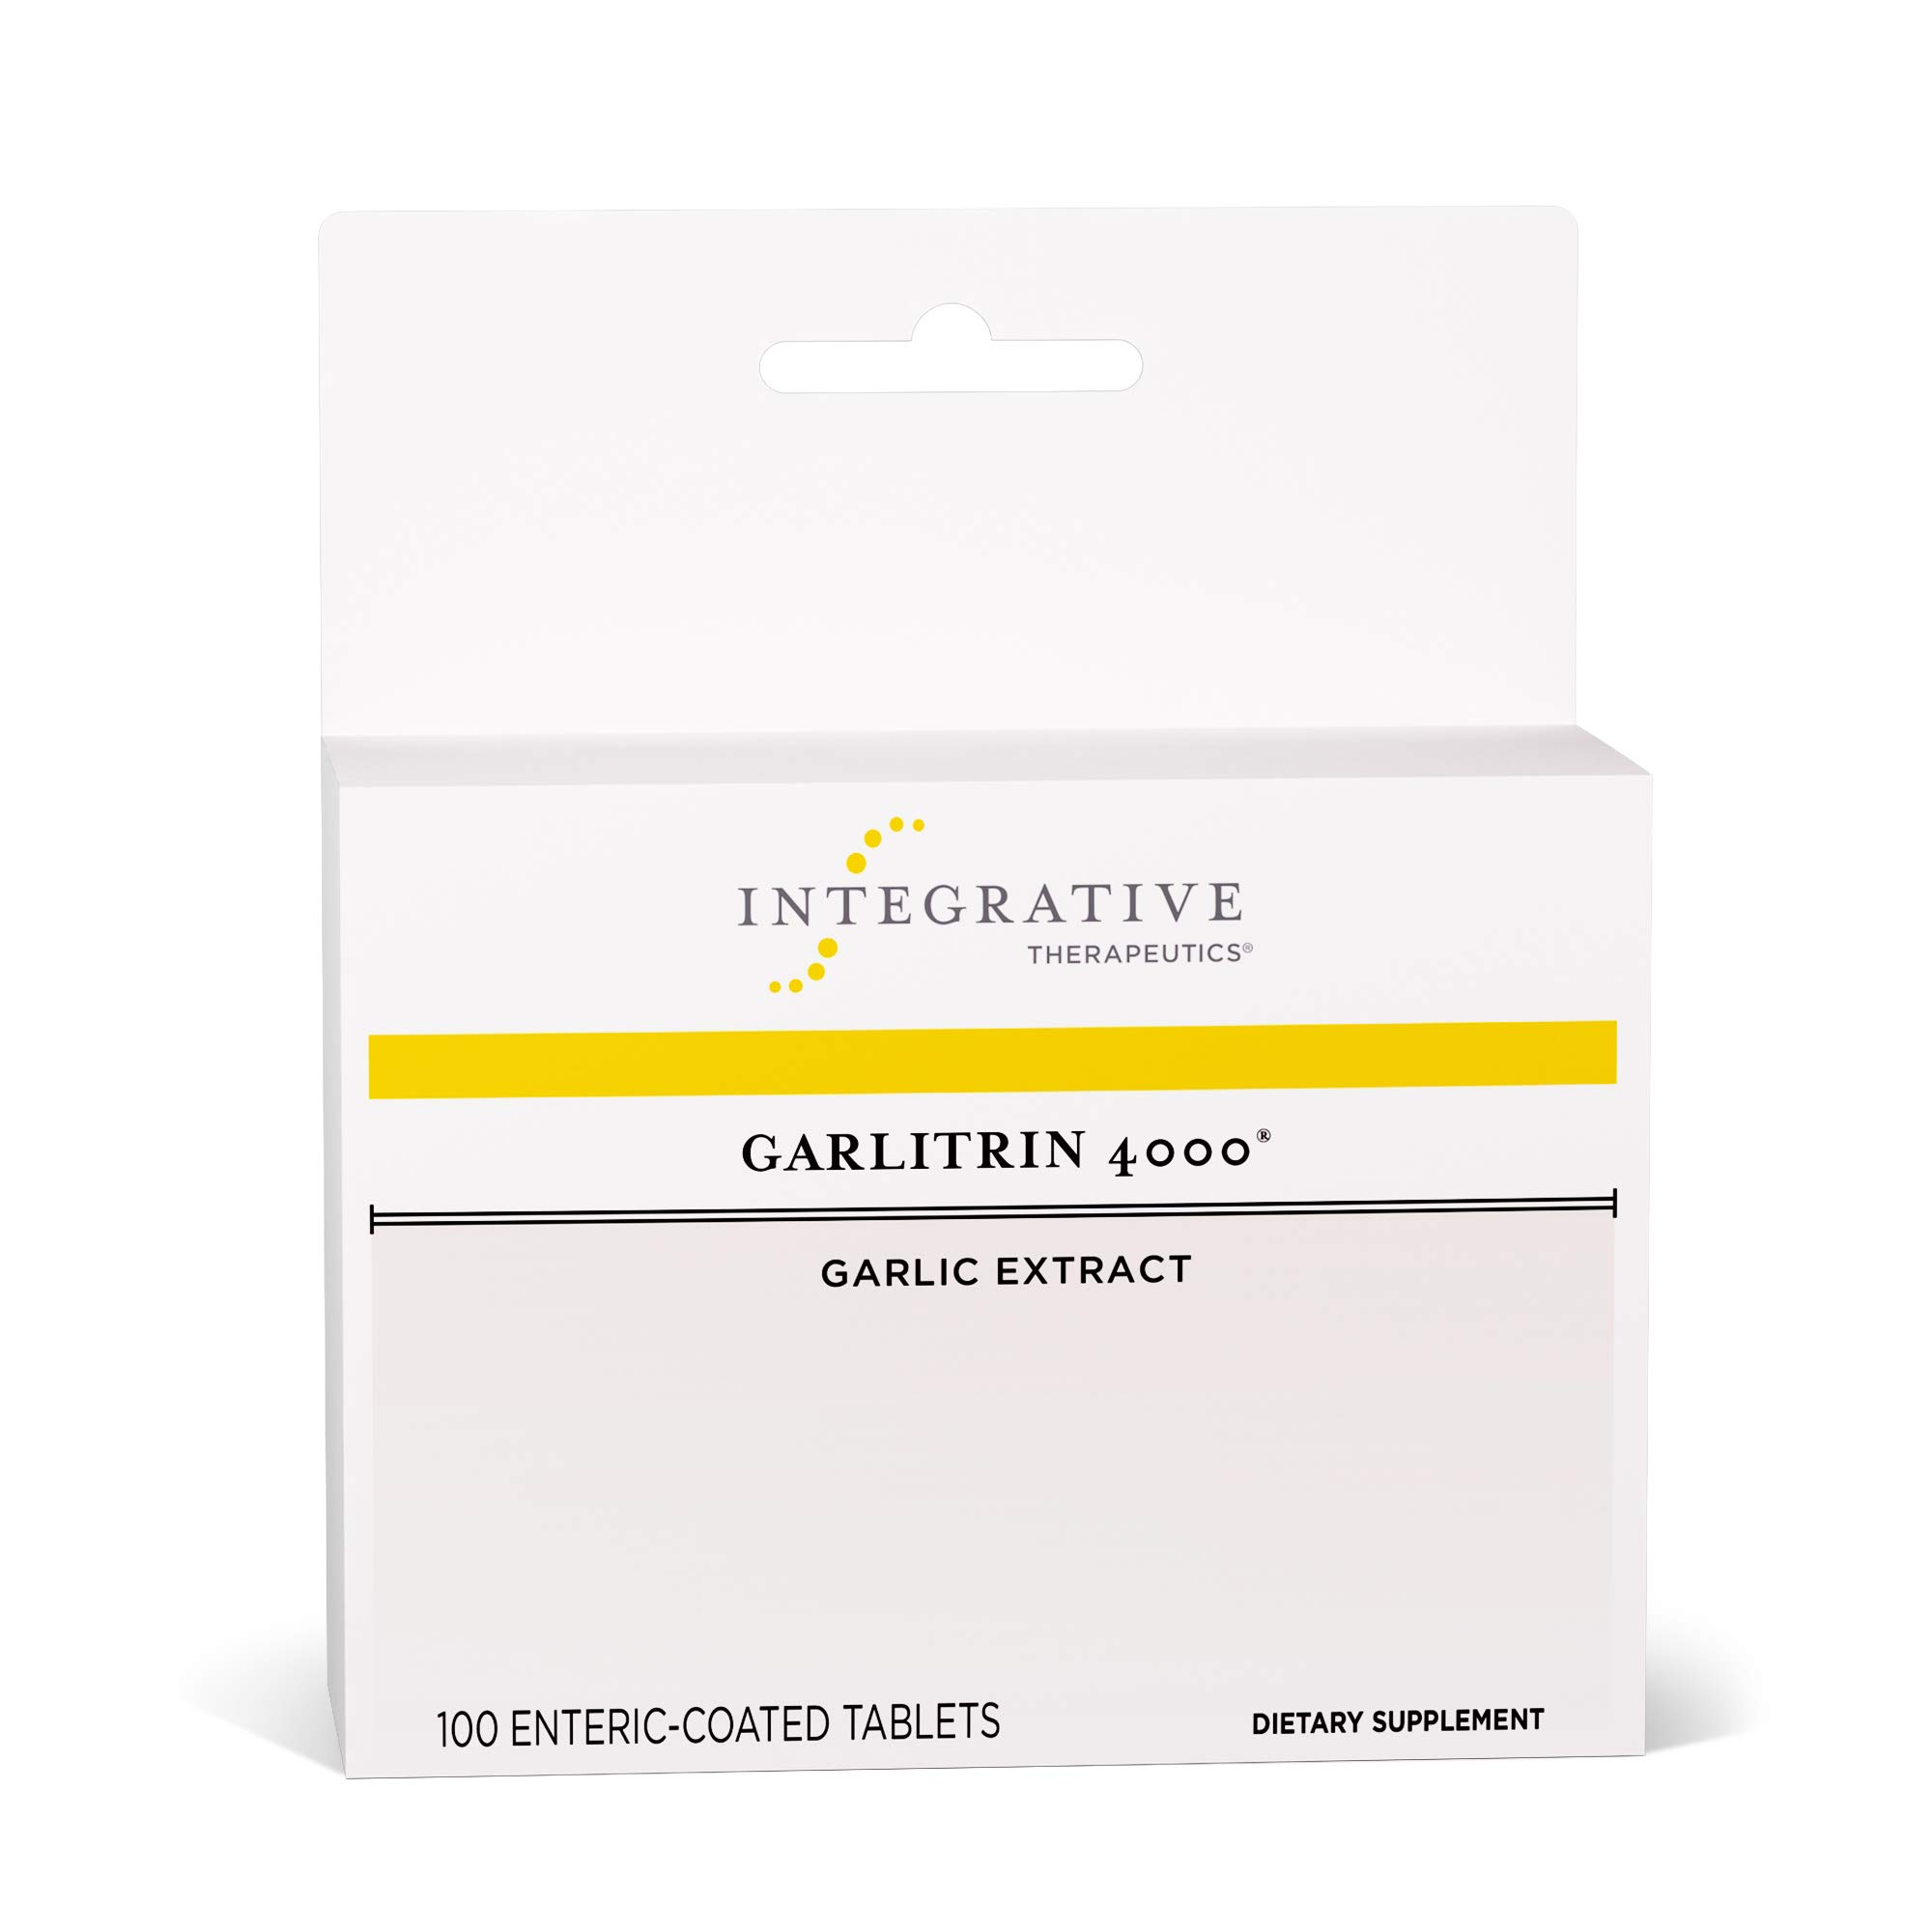 Integrative Therapeutics - Garlitrin 4000 - Garlic Extract - 100 Enteric Coated Tablets